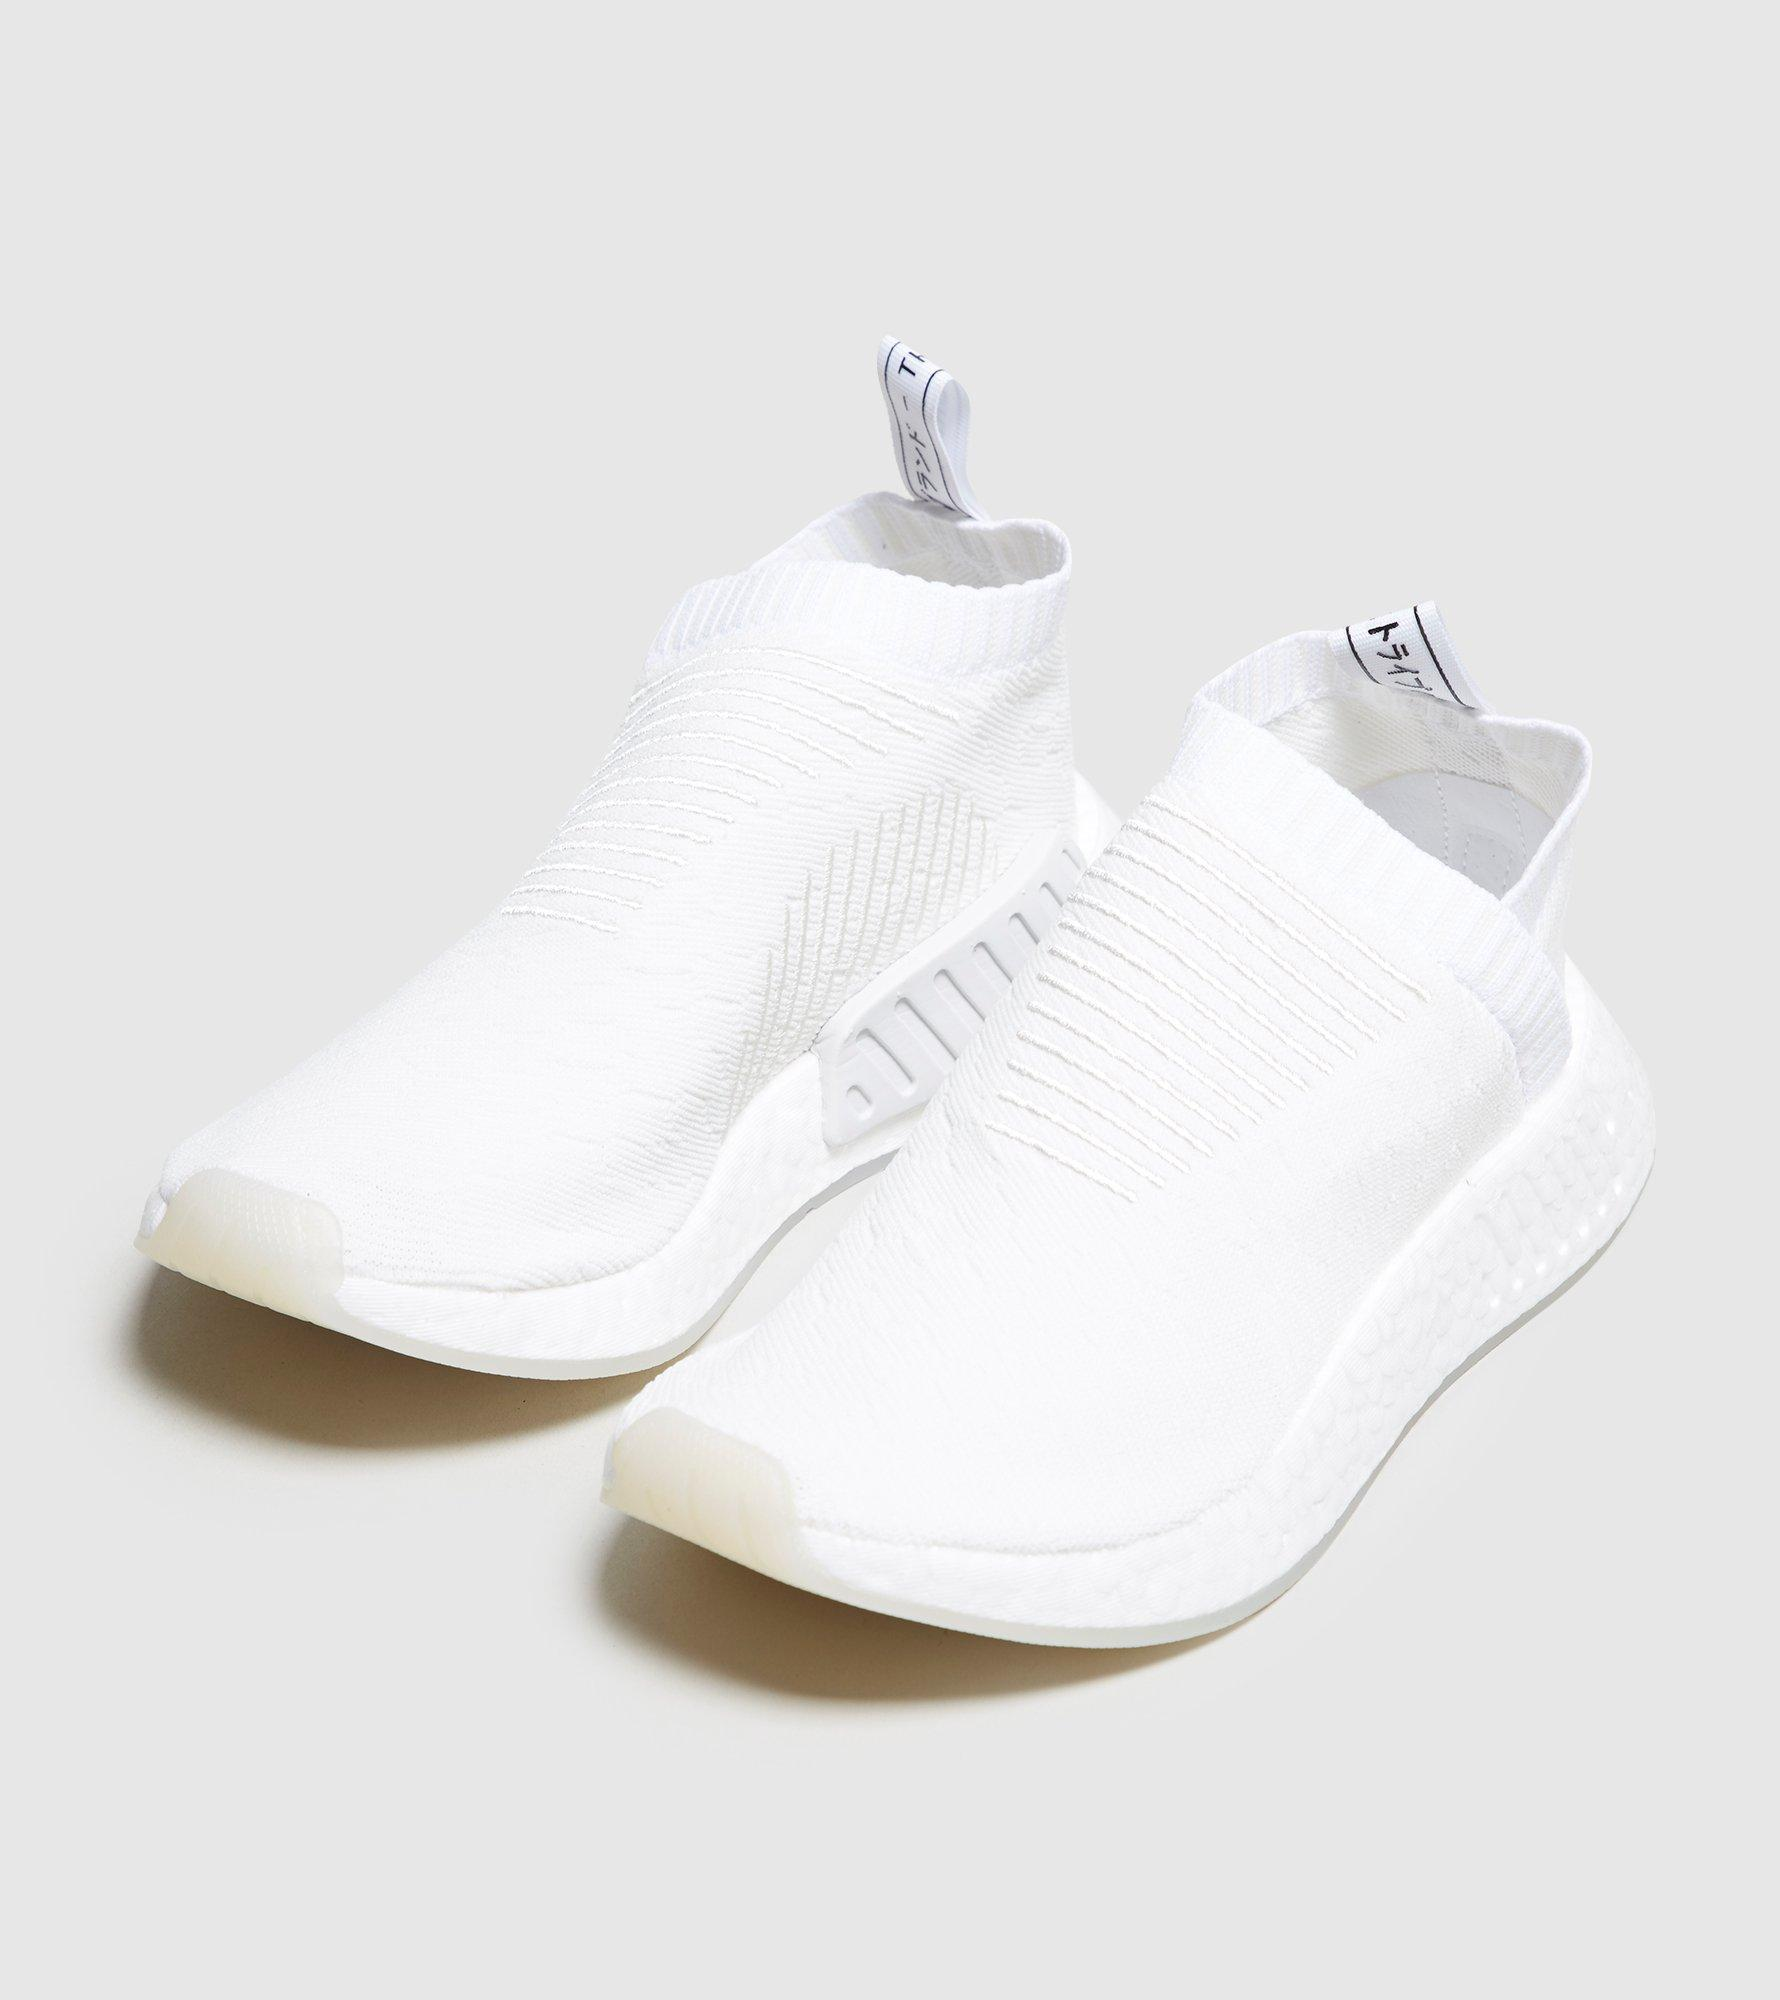 adidas Originals Rubber Nmd_cs2 Primeknit Women's in White